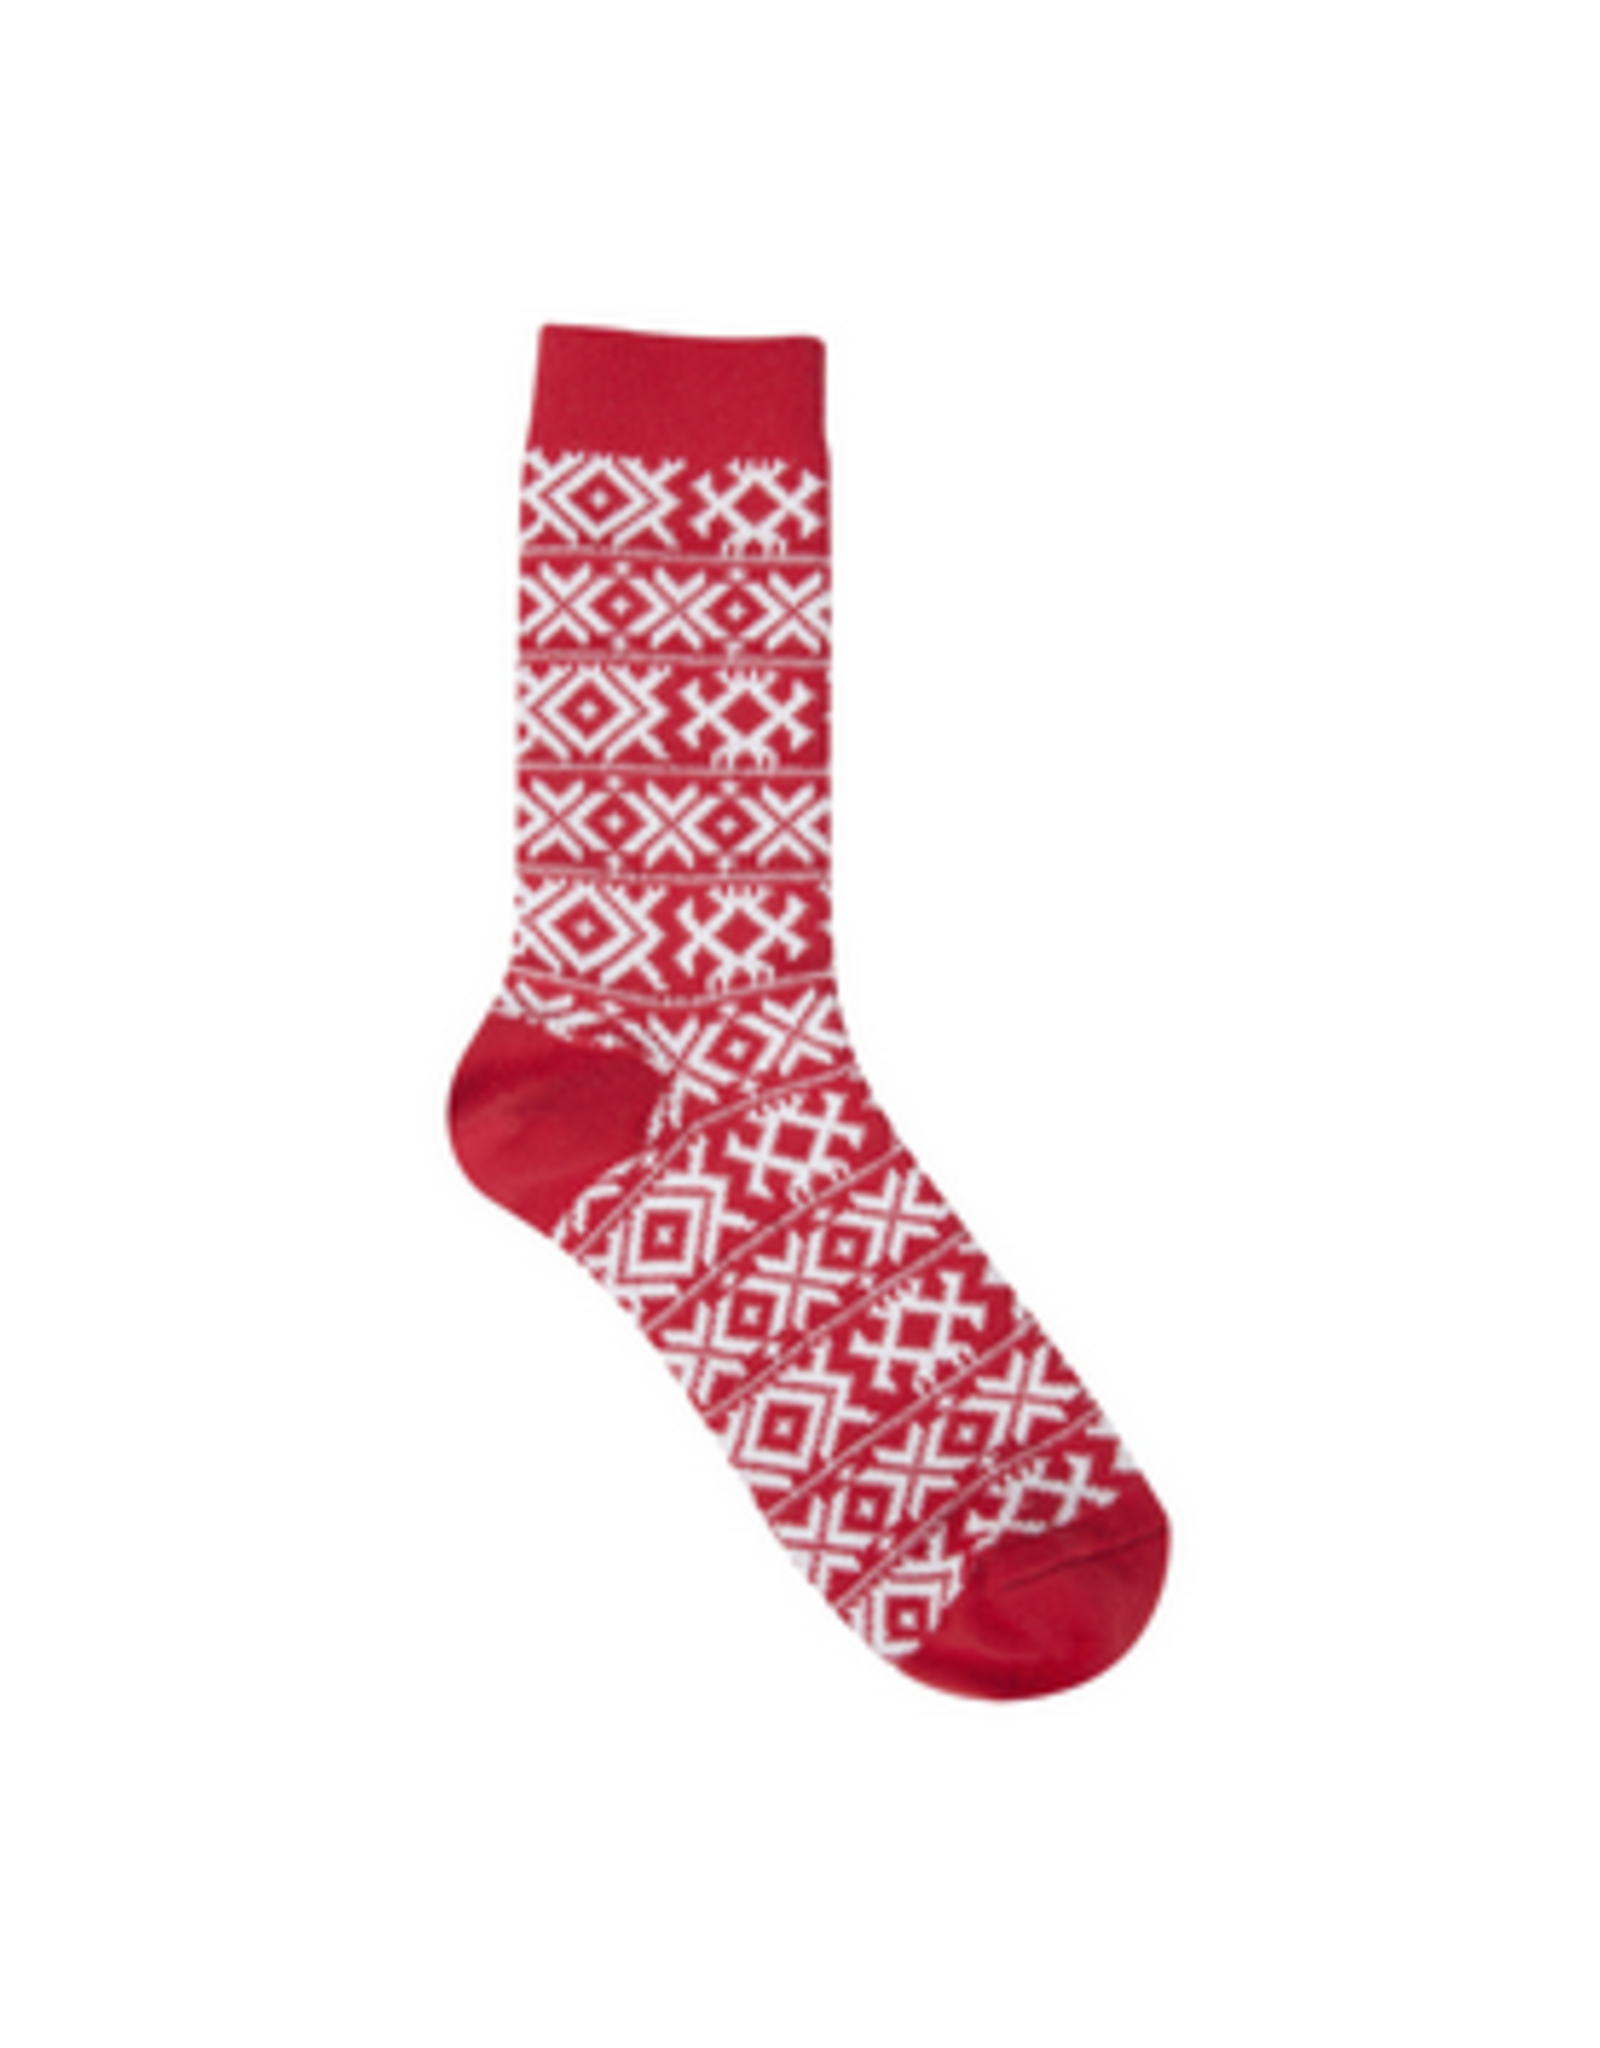 Gallery XOXO Crew Socks, red hot